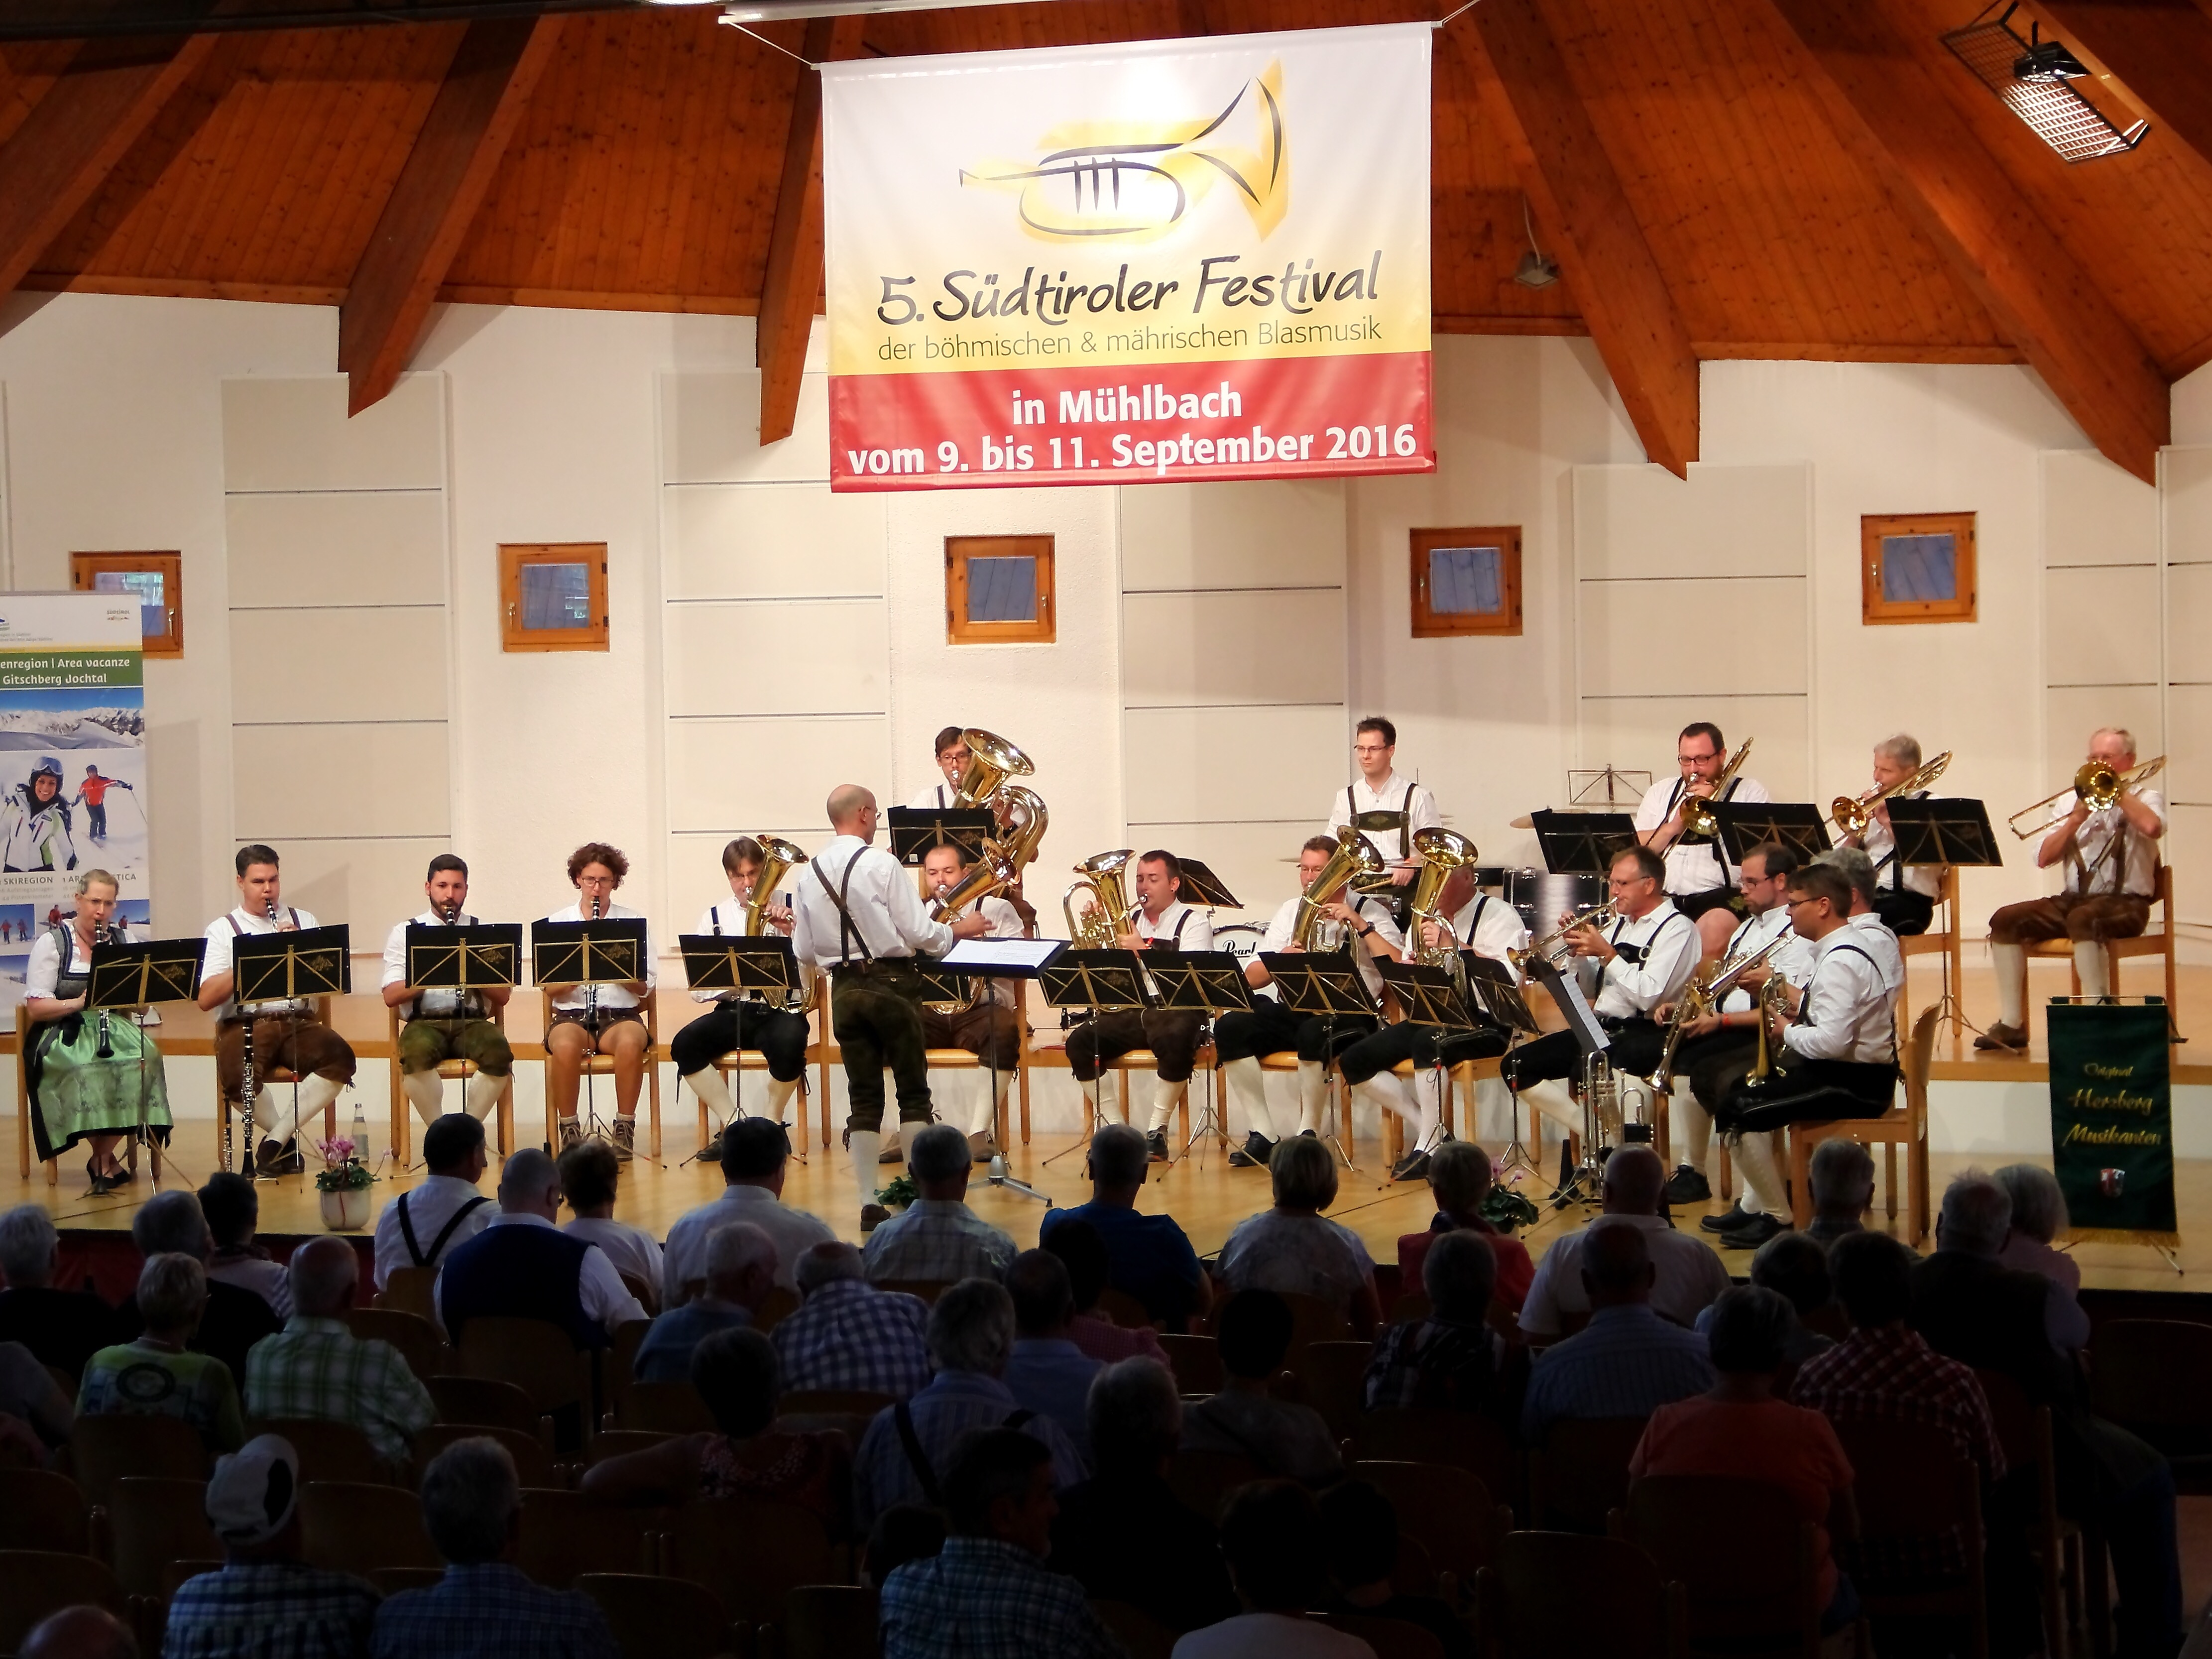 5. Südtiroler Festival der Blasmusik